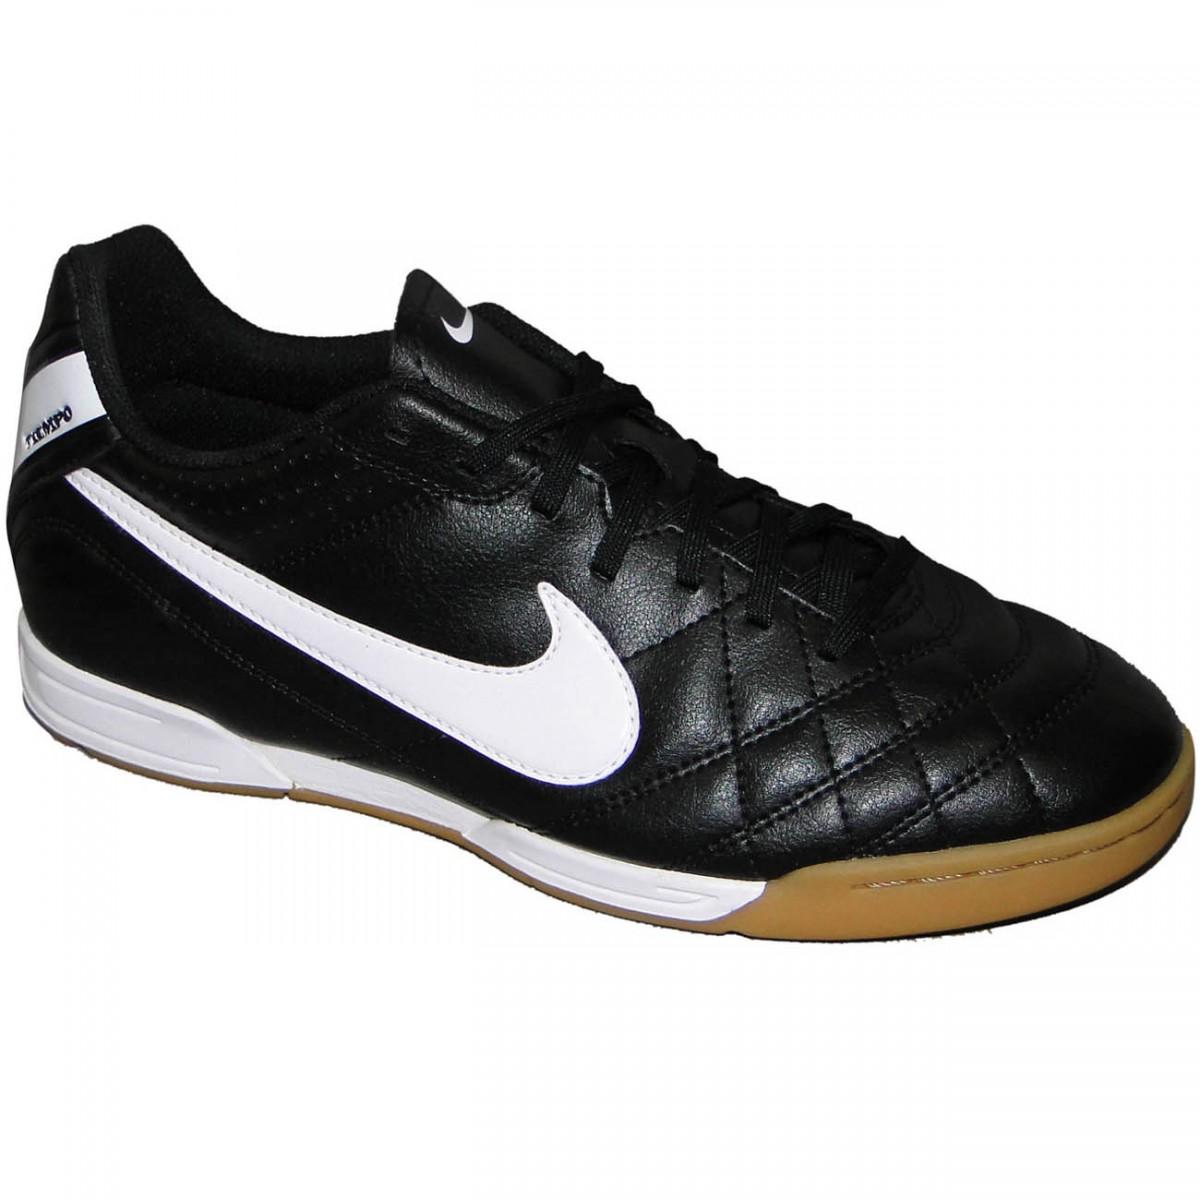 TENIS NIKE TIEMPO NATURAL IV 9215 - PRETO BRANCO LARANJA - Chuteira Nike 76ac8796a94f9